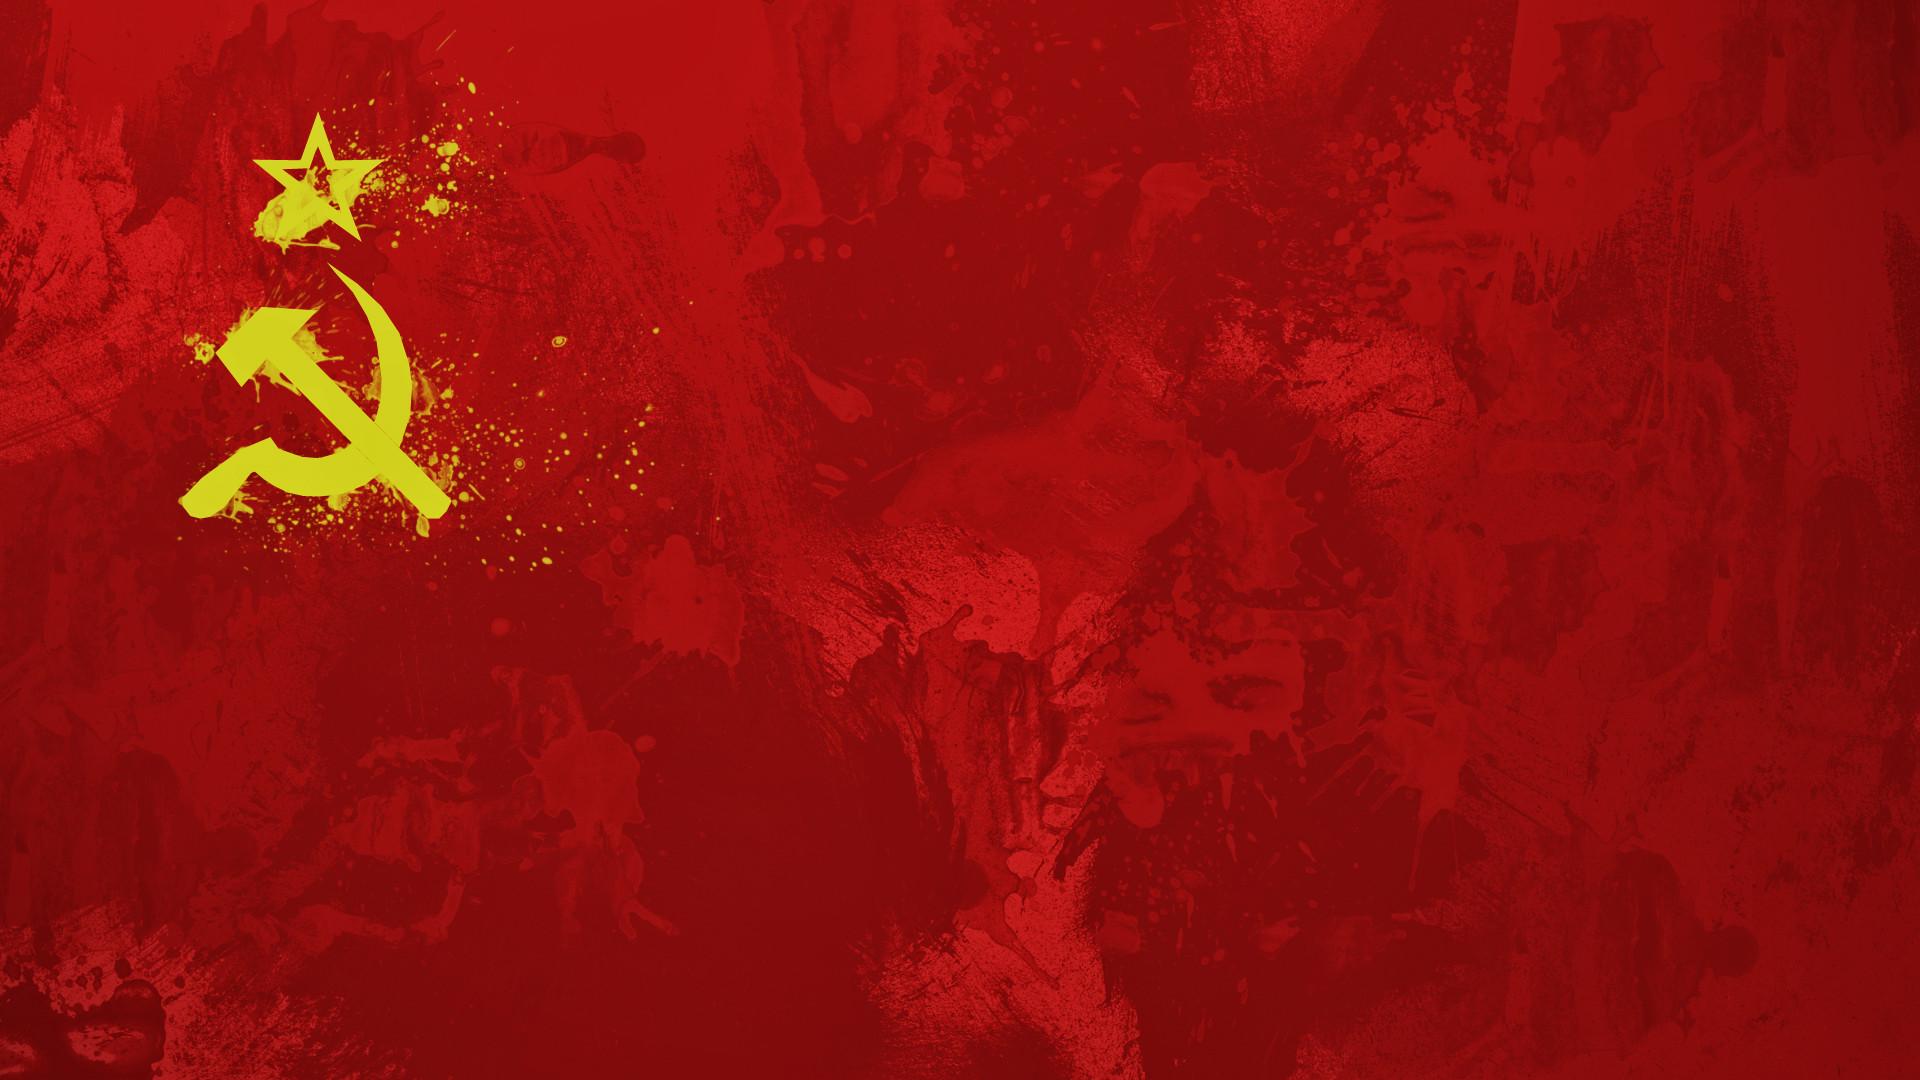 Chinese Flag Wallpaper by GaryckArntzen.deviantart.com on @deviantART | Art  | Pinterest | deviantART